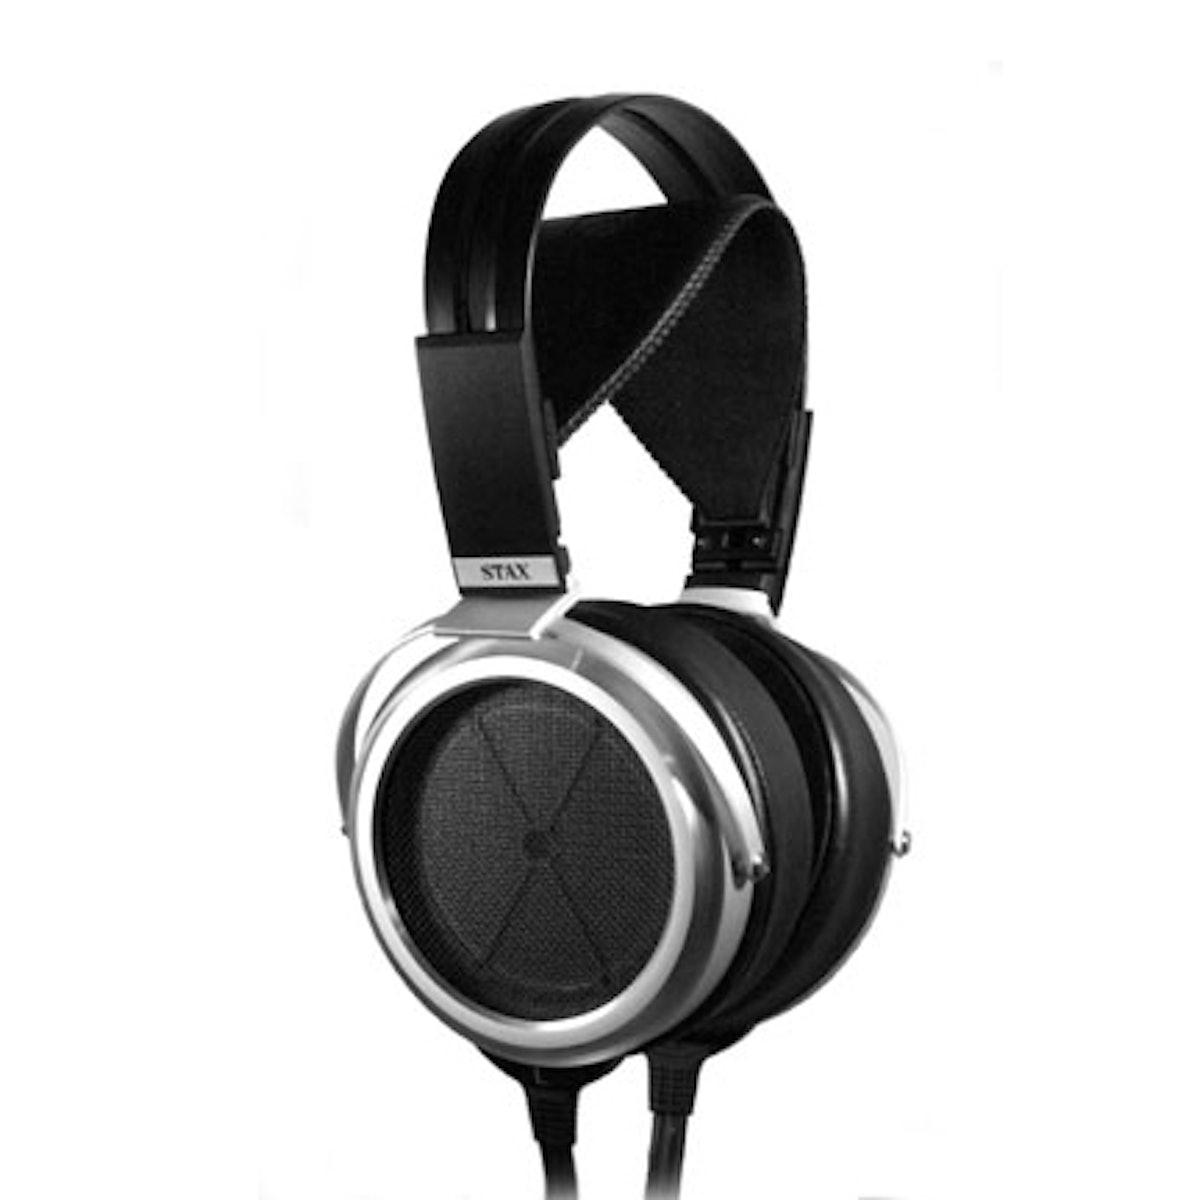 7.-STAX-$4450-STAXUSA.COM